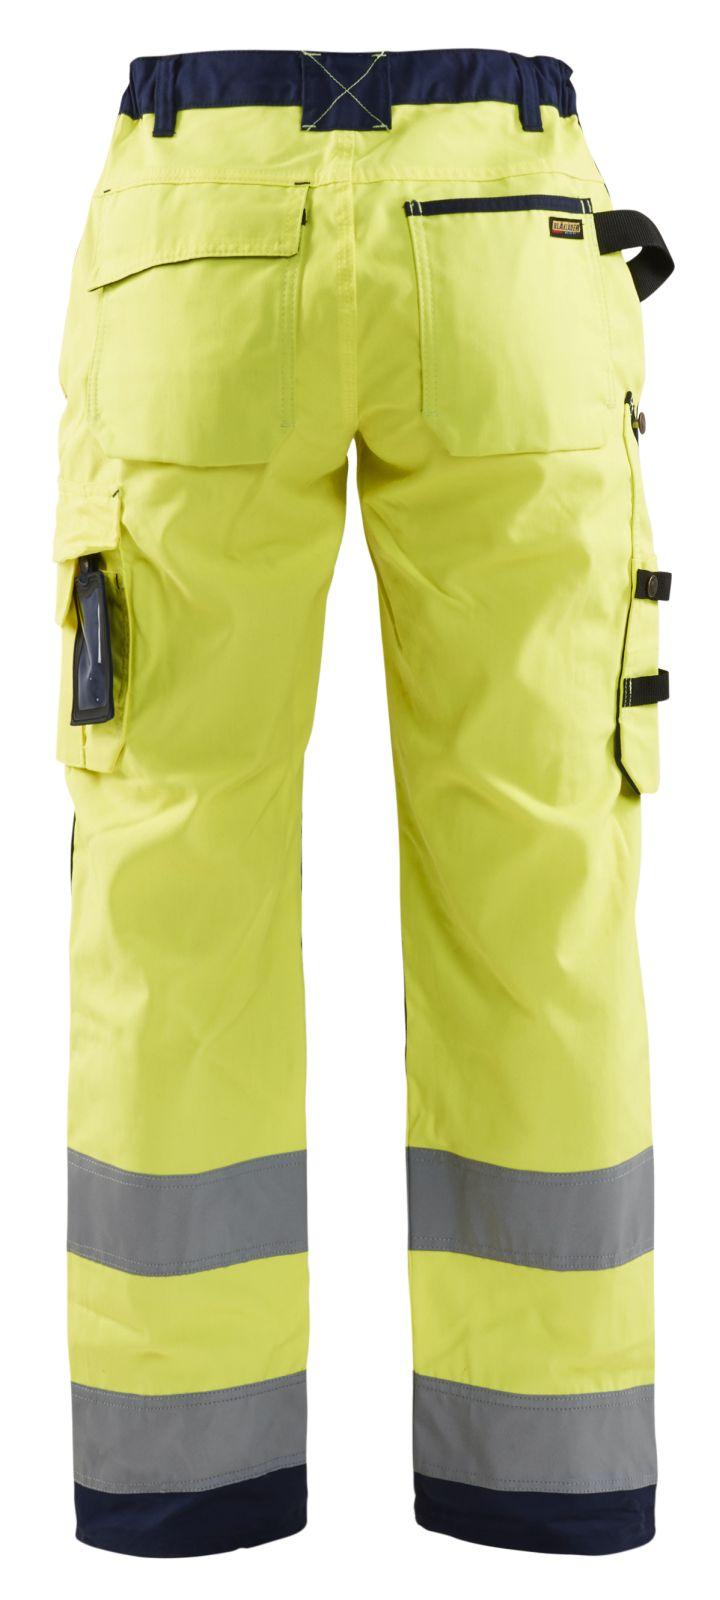 Blaklader Dames werkbroeken 71551811 High Vis geel-marineblauw(3389)